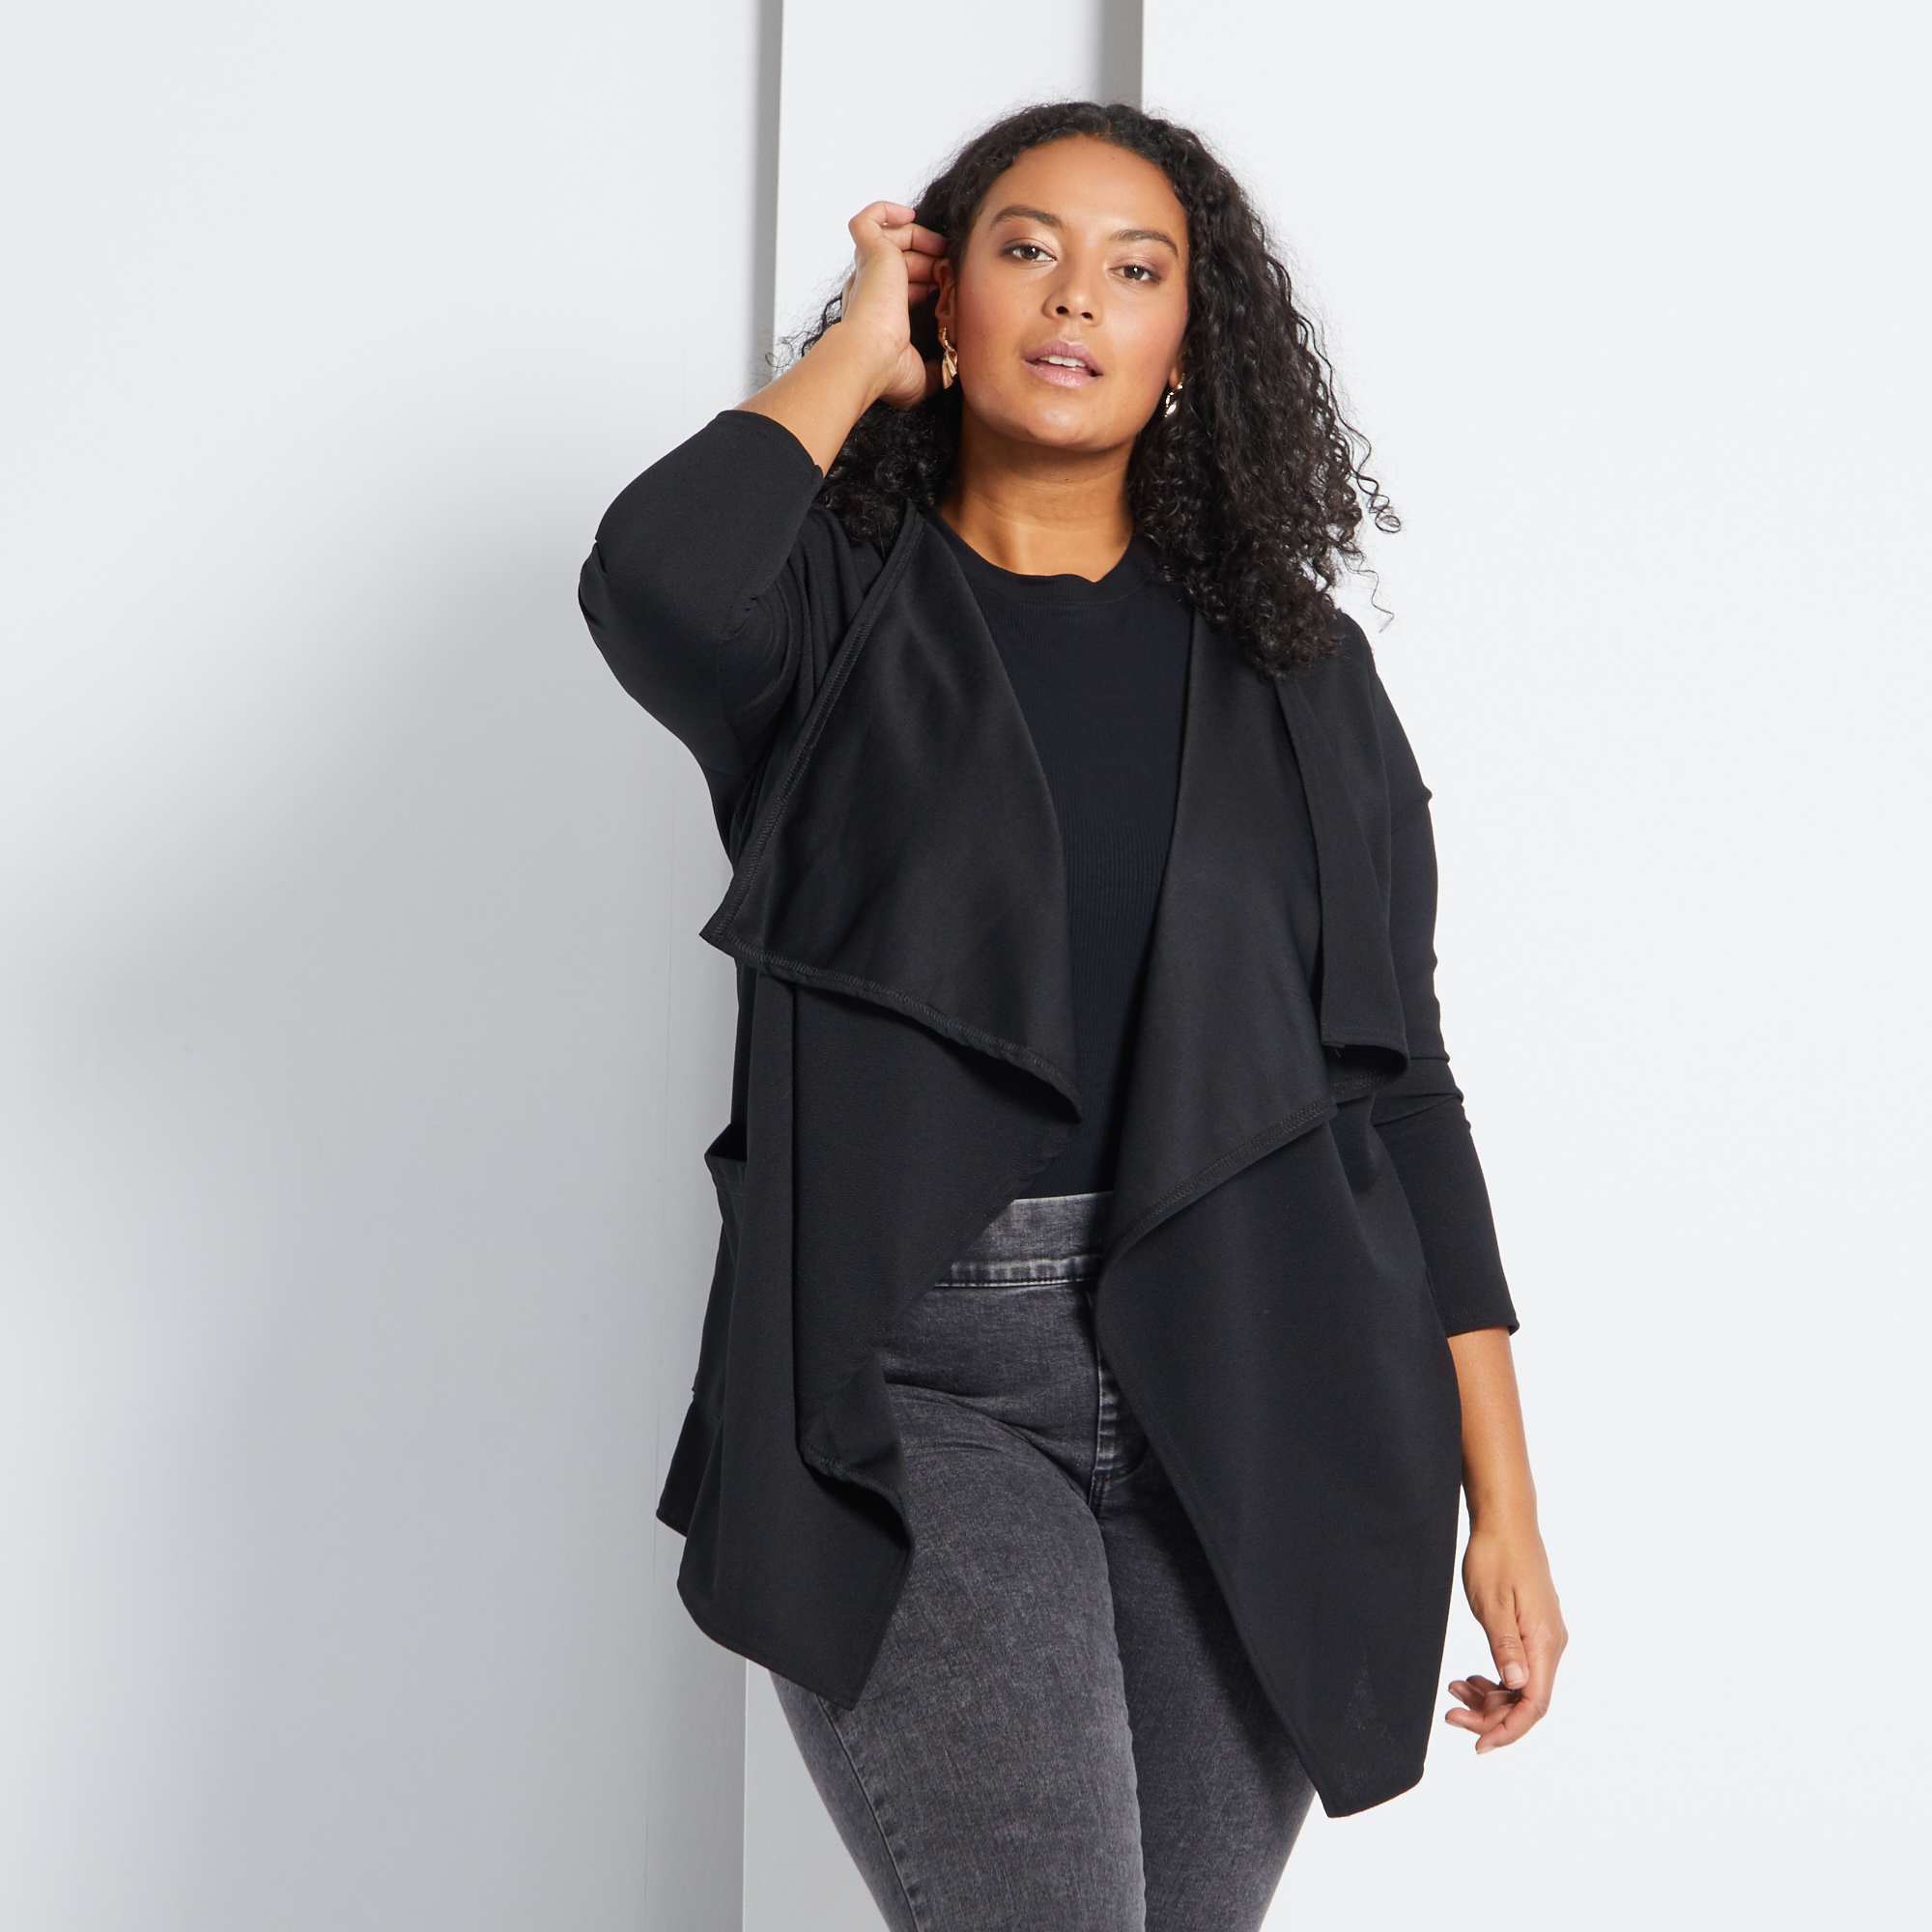 54f5e39b61c Chaqueta estilo blazer con faldones de punto crepé negro Tallas grandes  mujer. Loading zoom